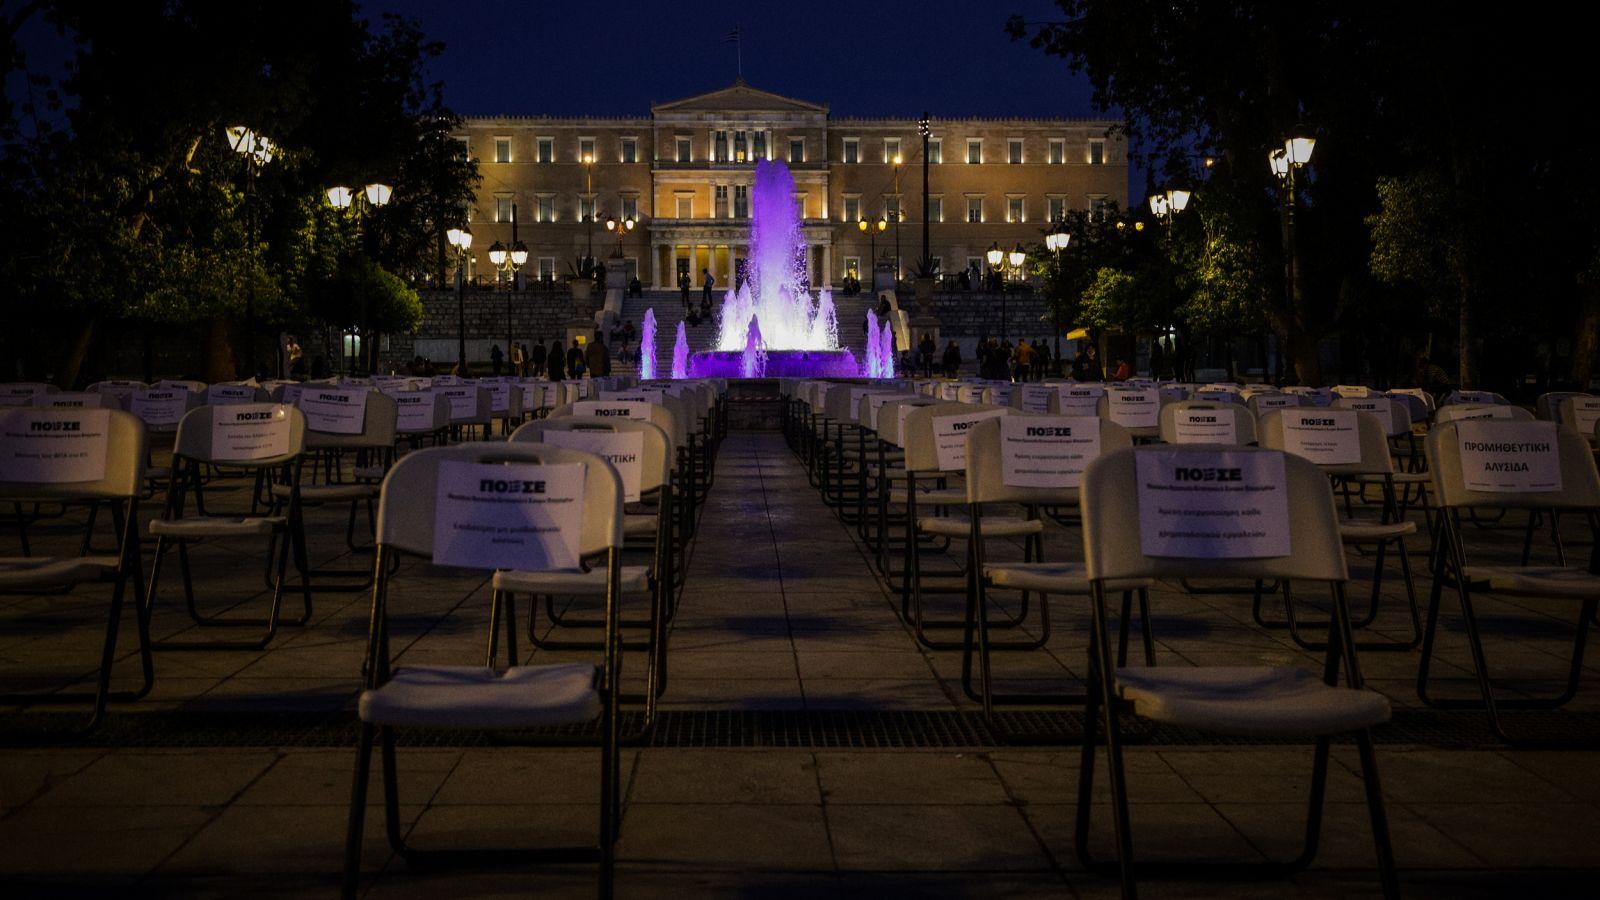 Empty chairs: Άδειες καρέκλες στο Σύνταγμα και όλη την Ελλάδα – Η διαμαρτυρία των επαγγελματιών στην εστίαση [pics]